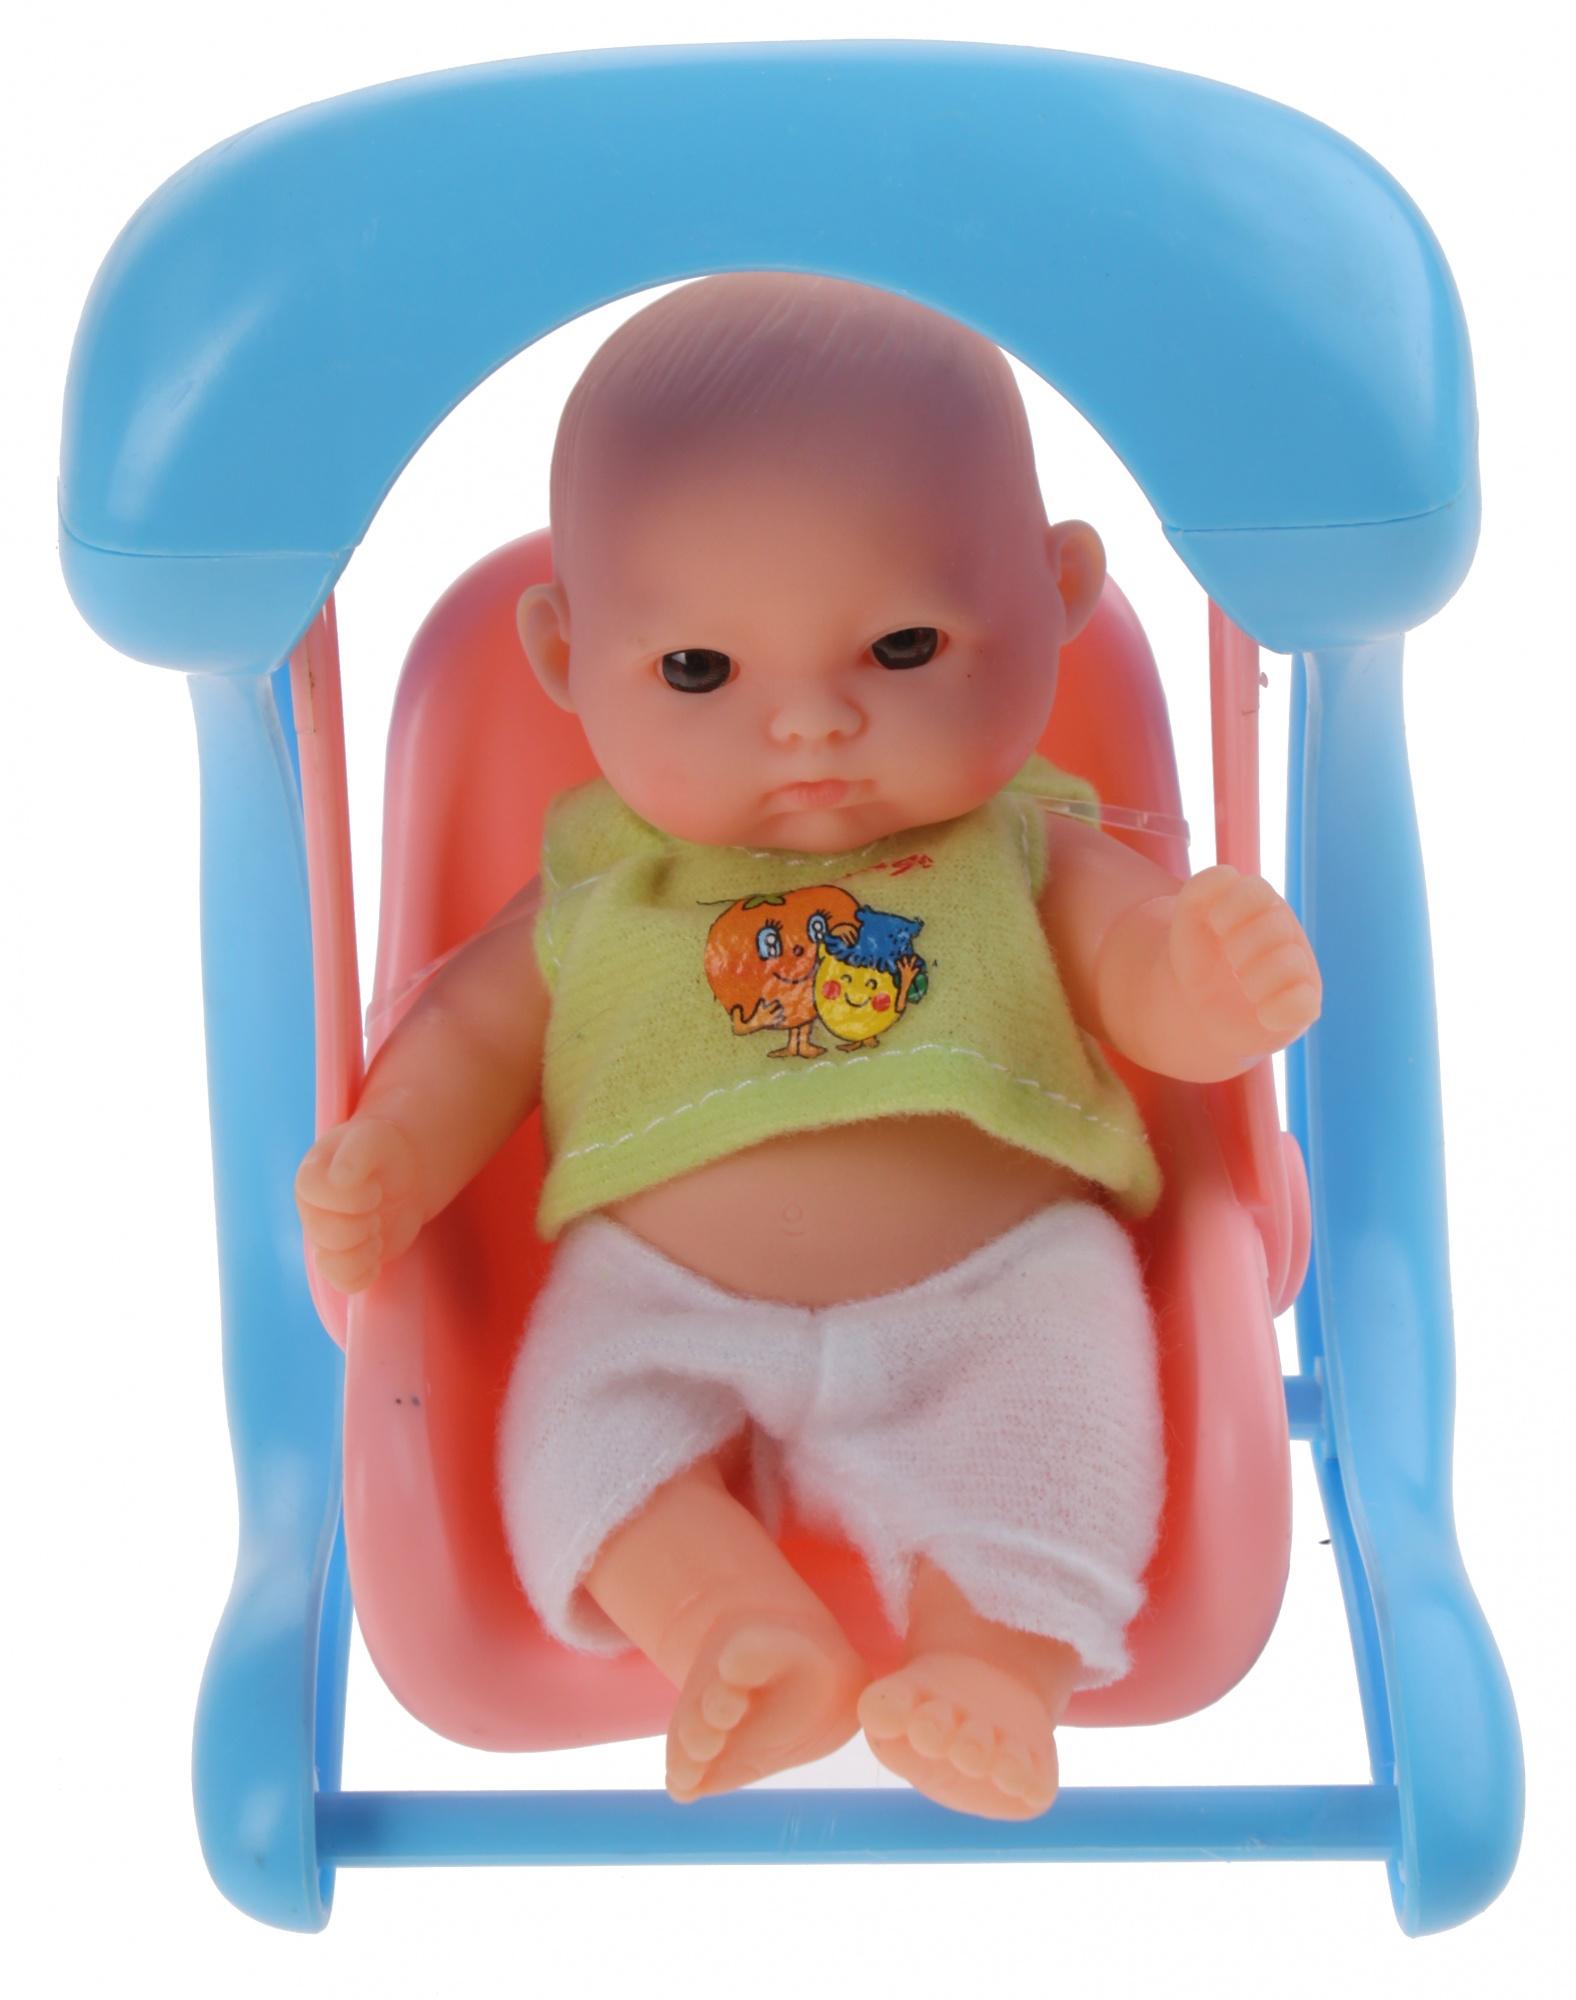 Swing Schommel Baby.Baby Doll With Swing 14 Cm